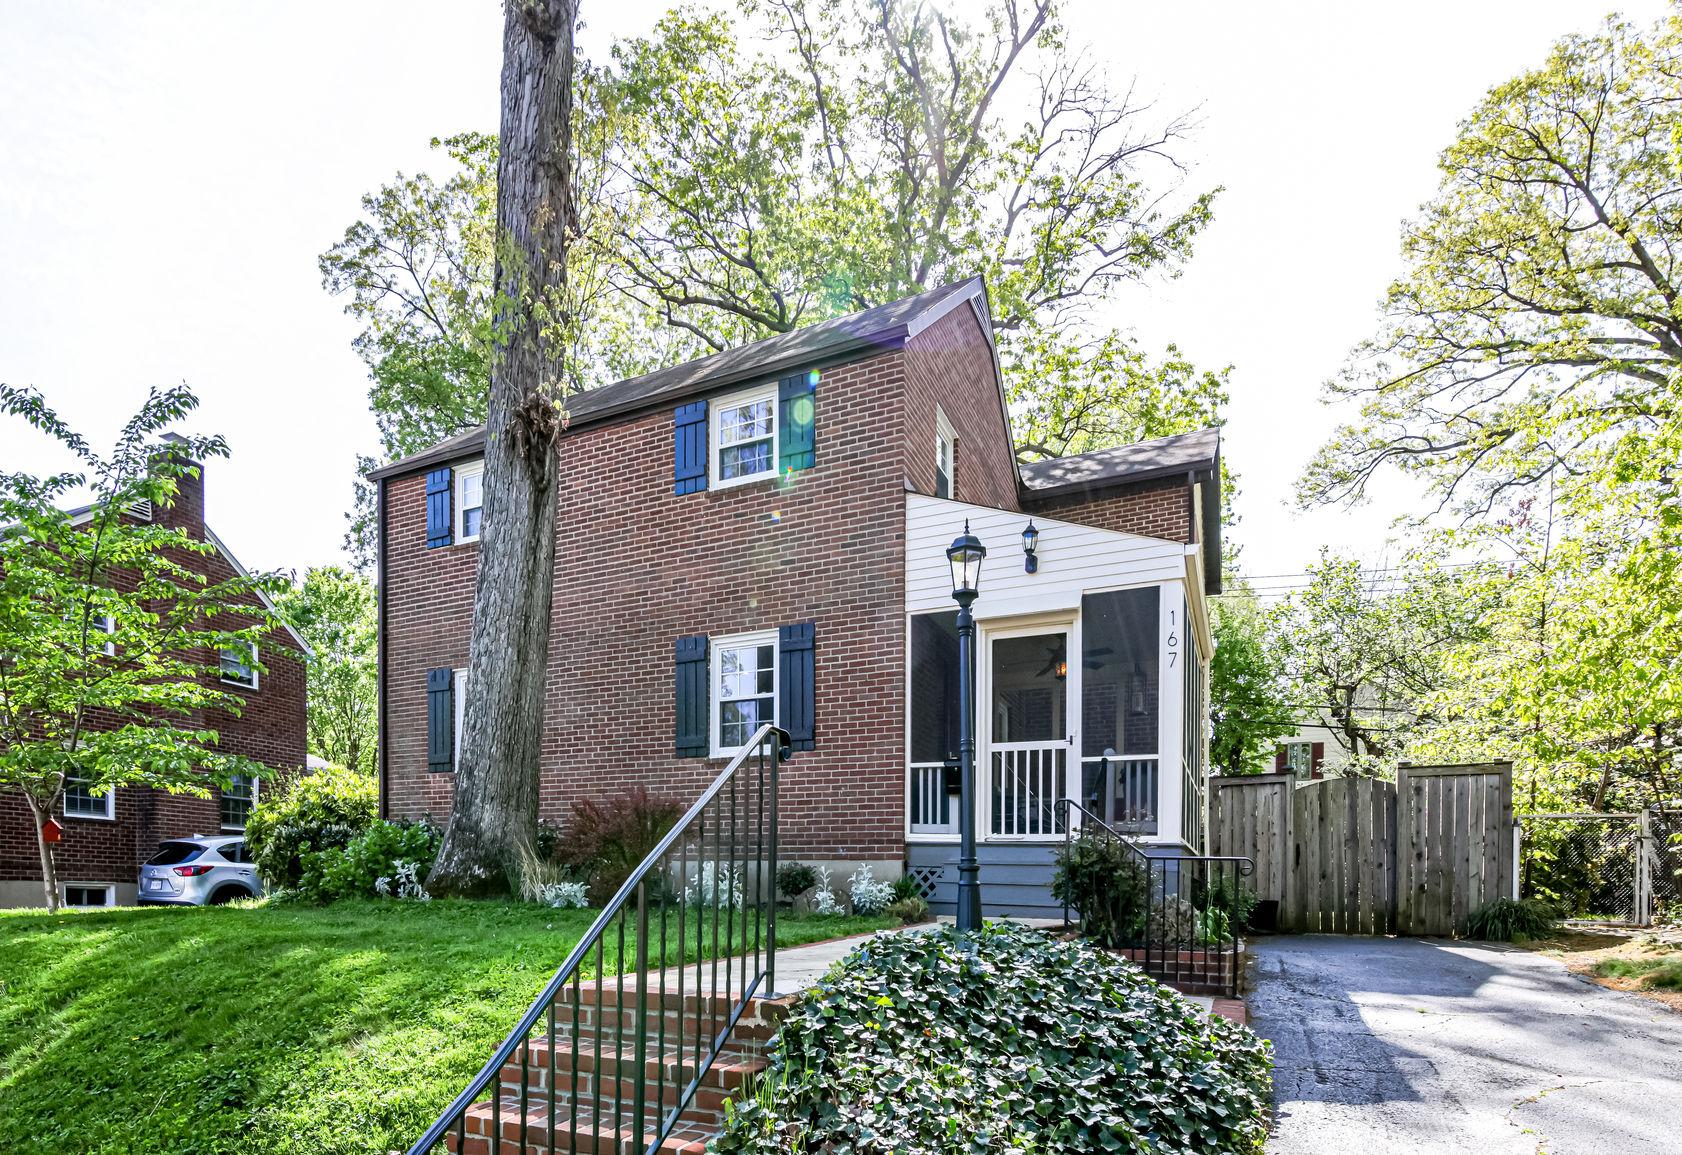 167 N Columbus St, Arlington- For Sale